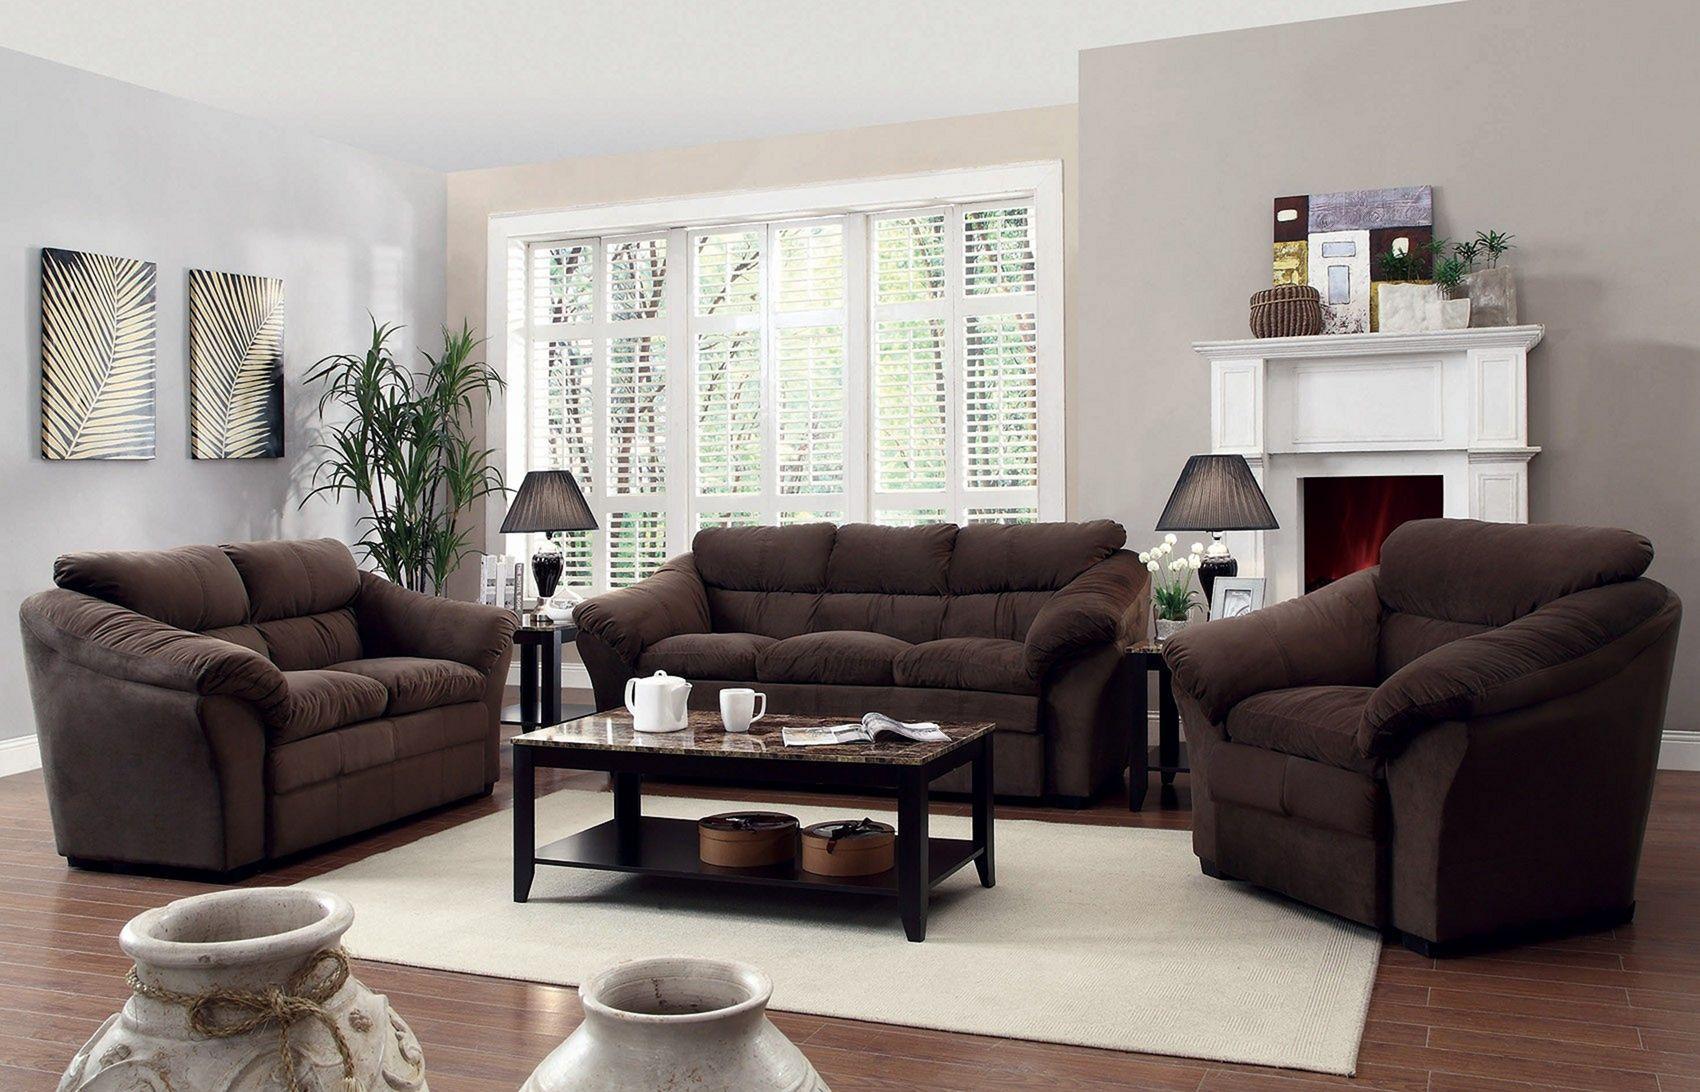 10+ Beautiful And Comfortable Living Room Furniture Set ...